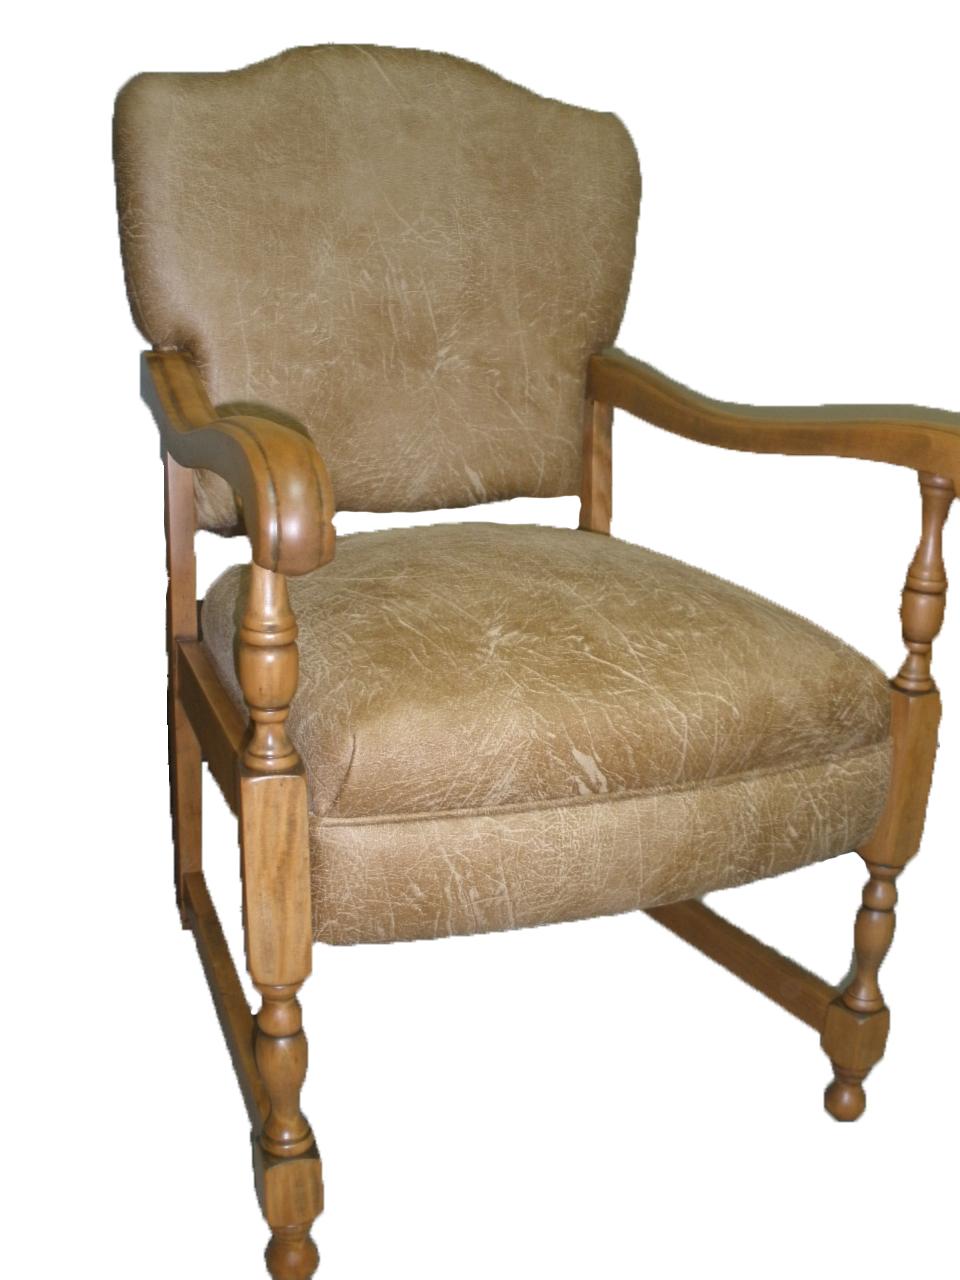 rembourrage-larrivee-chaise-bois.jpg